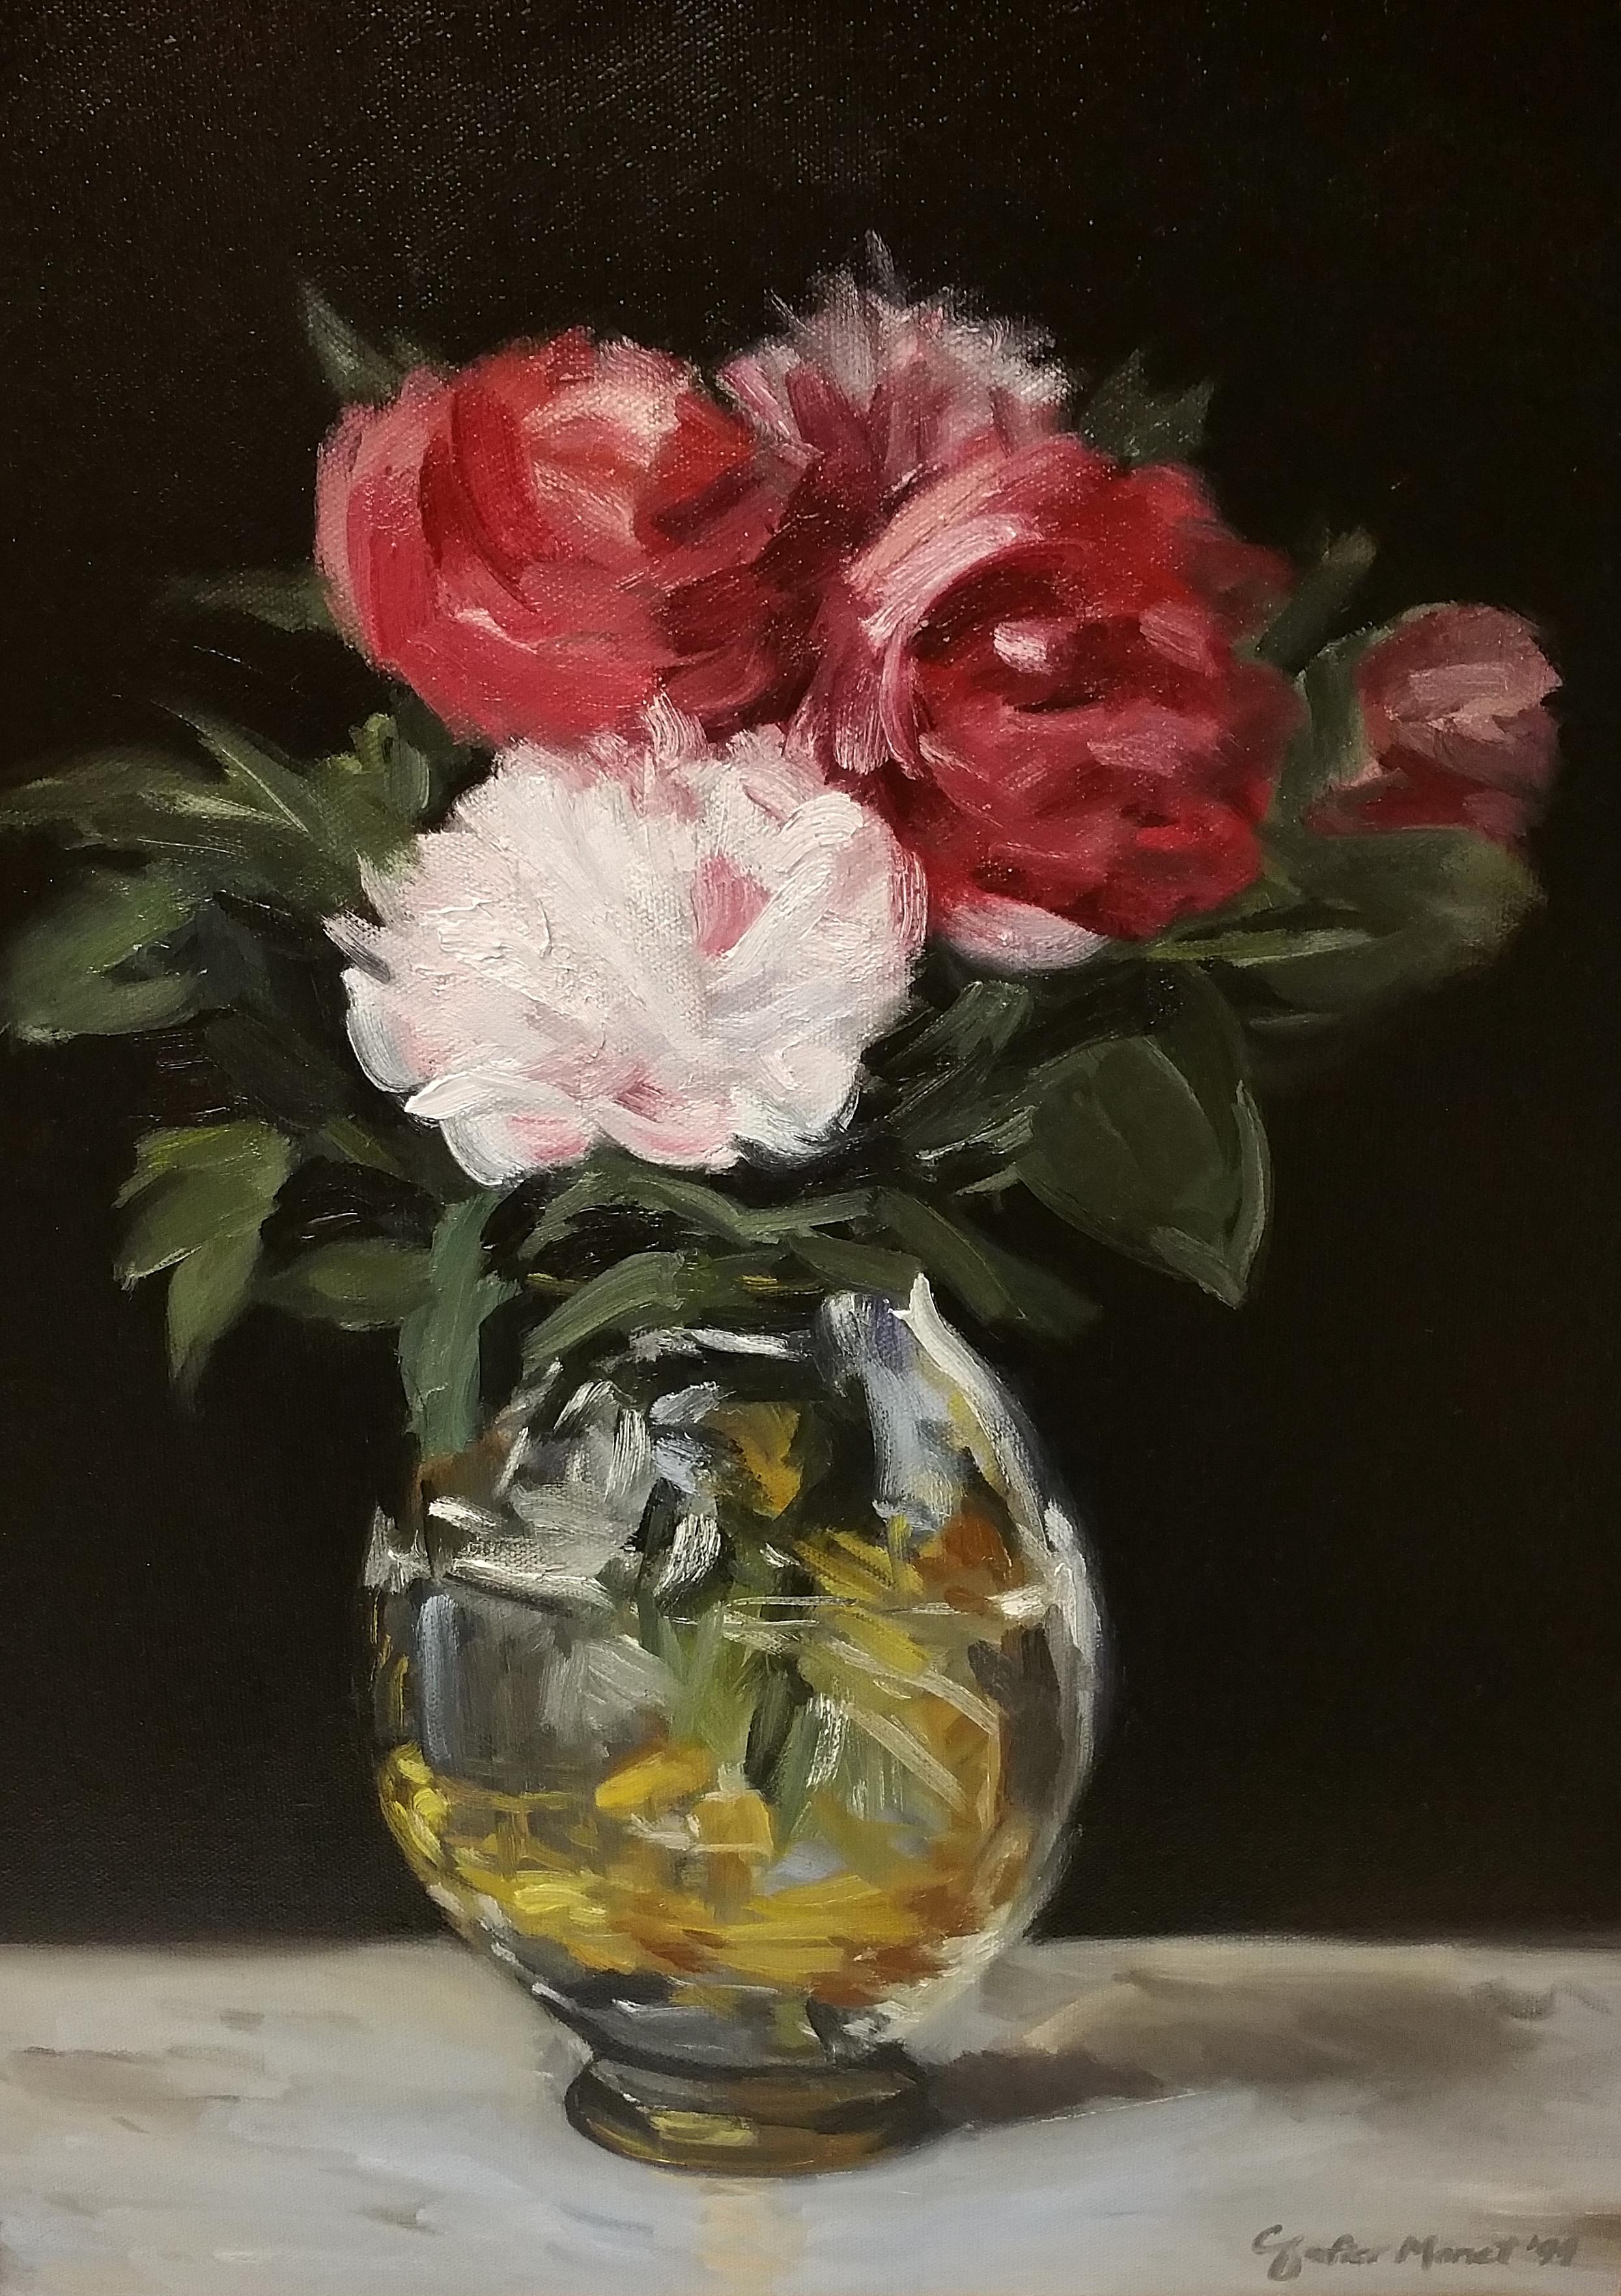 Datei:Édouard Manet Bouquet of Peonies.JPG – Wikipedia |Manet Flowers